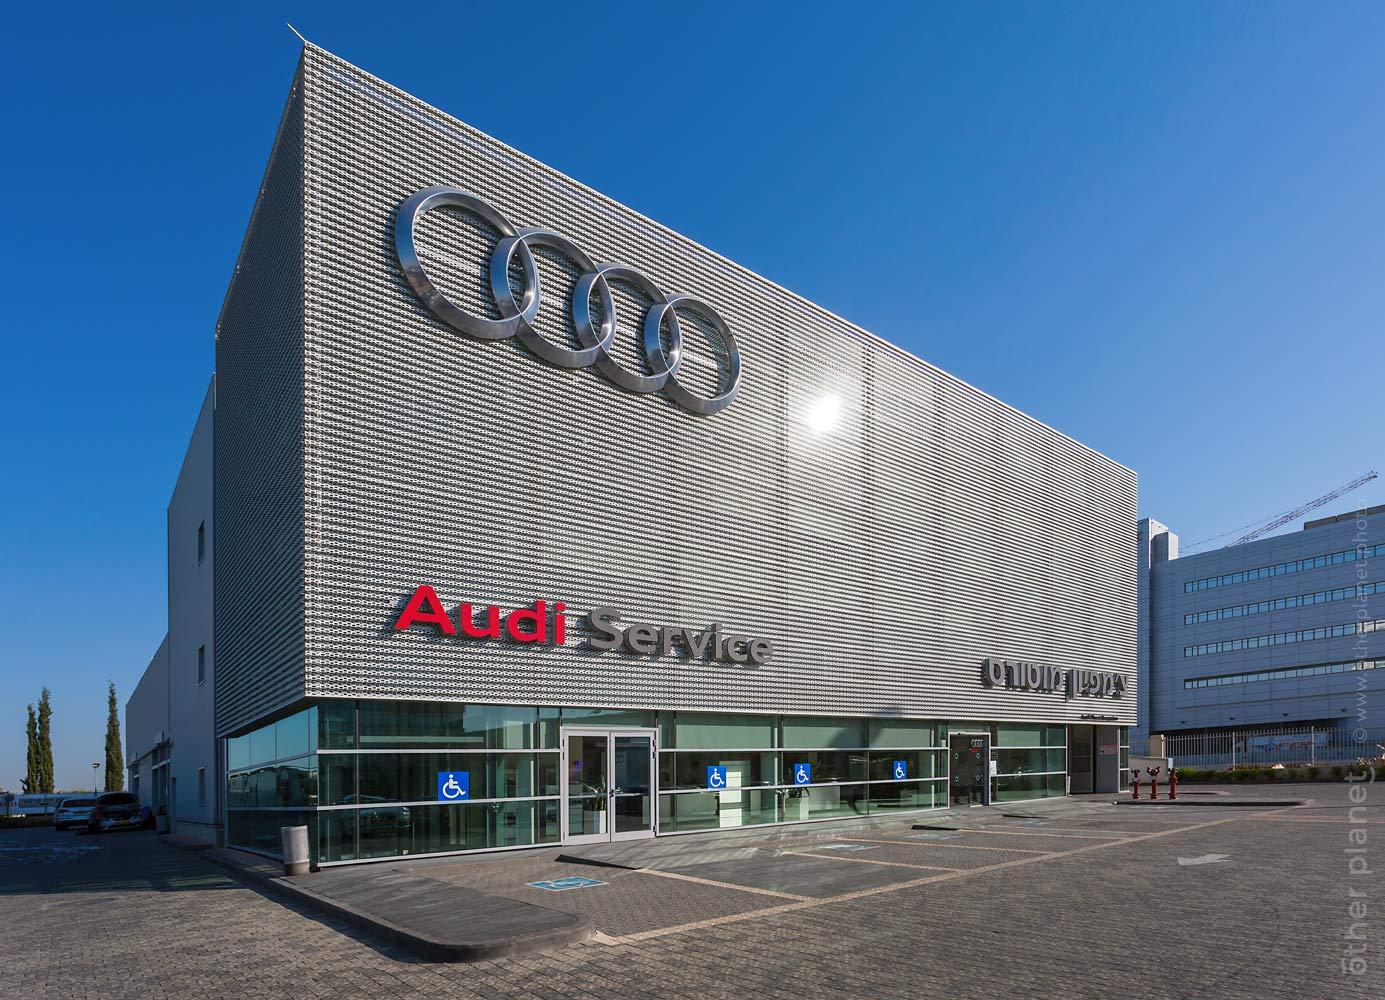 Audi service center exterior